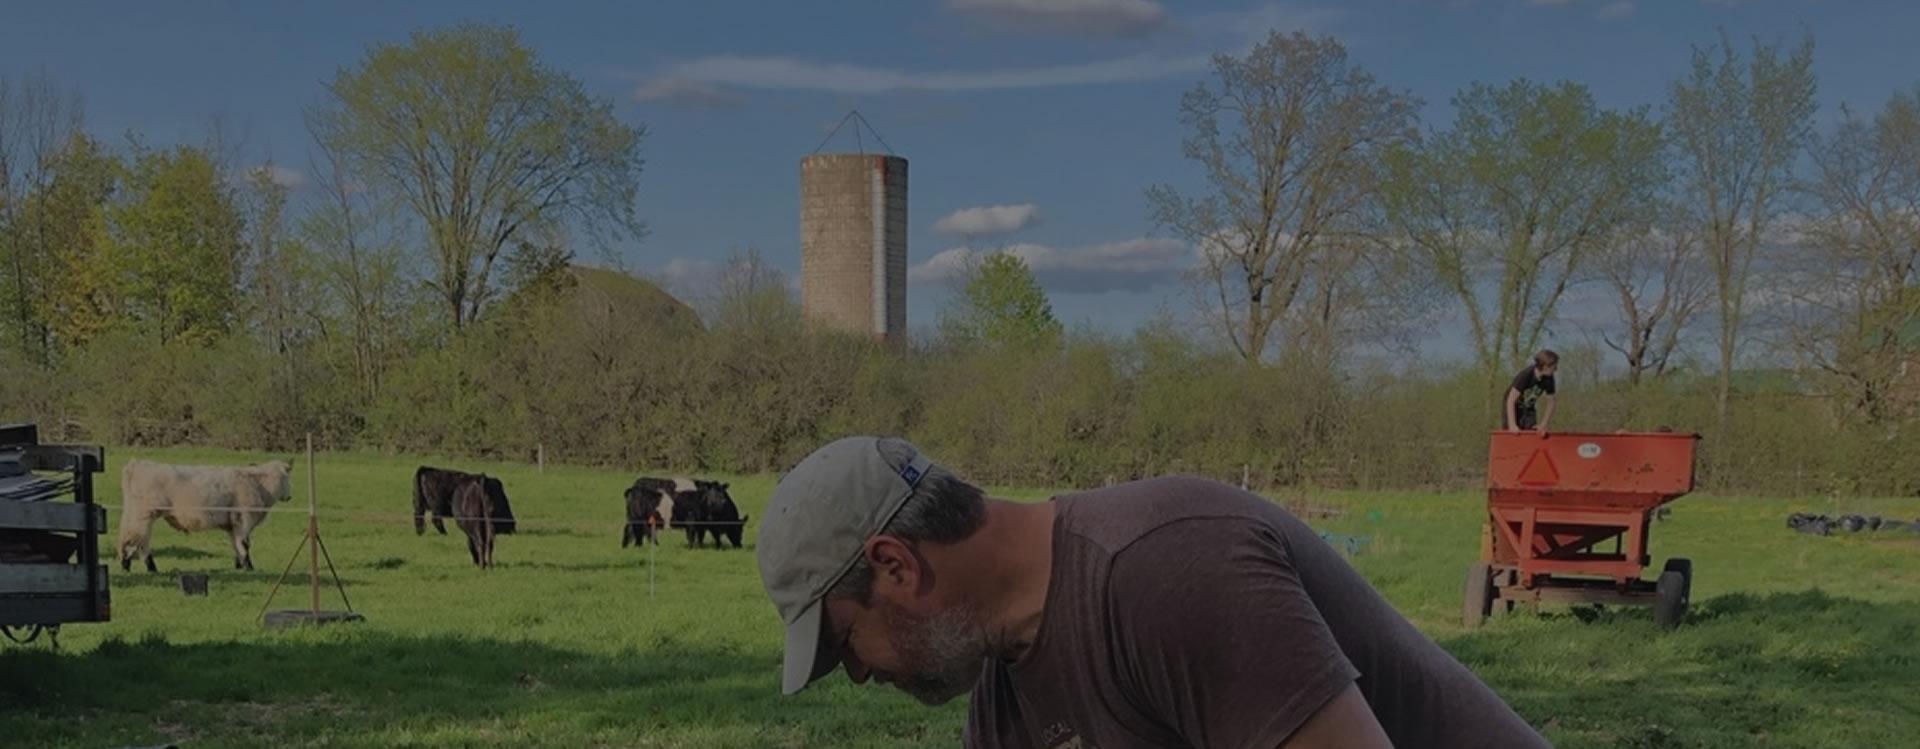 FieldSparrow Farms-KawarthaLakes - Pasture-raised-meats